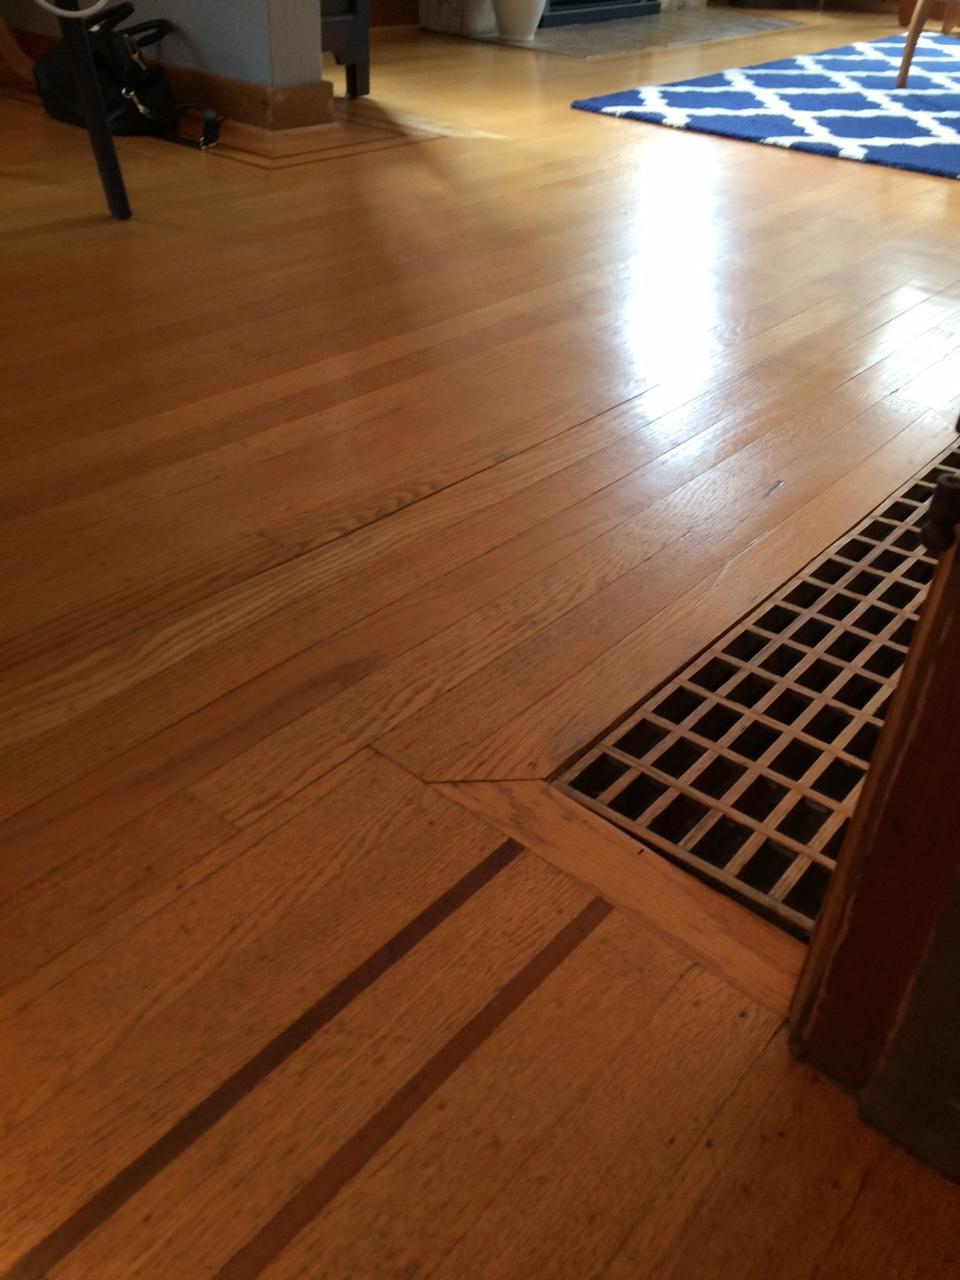 Radiant Heat Floor Panels